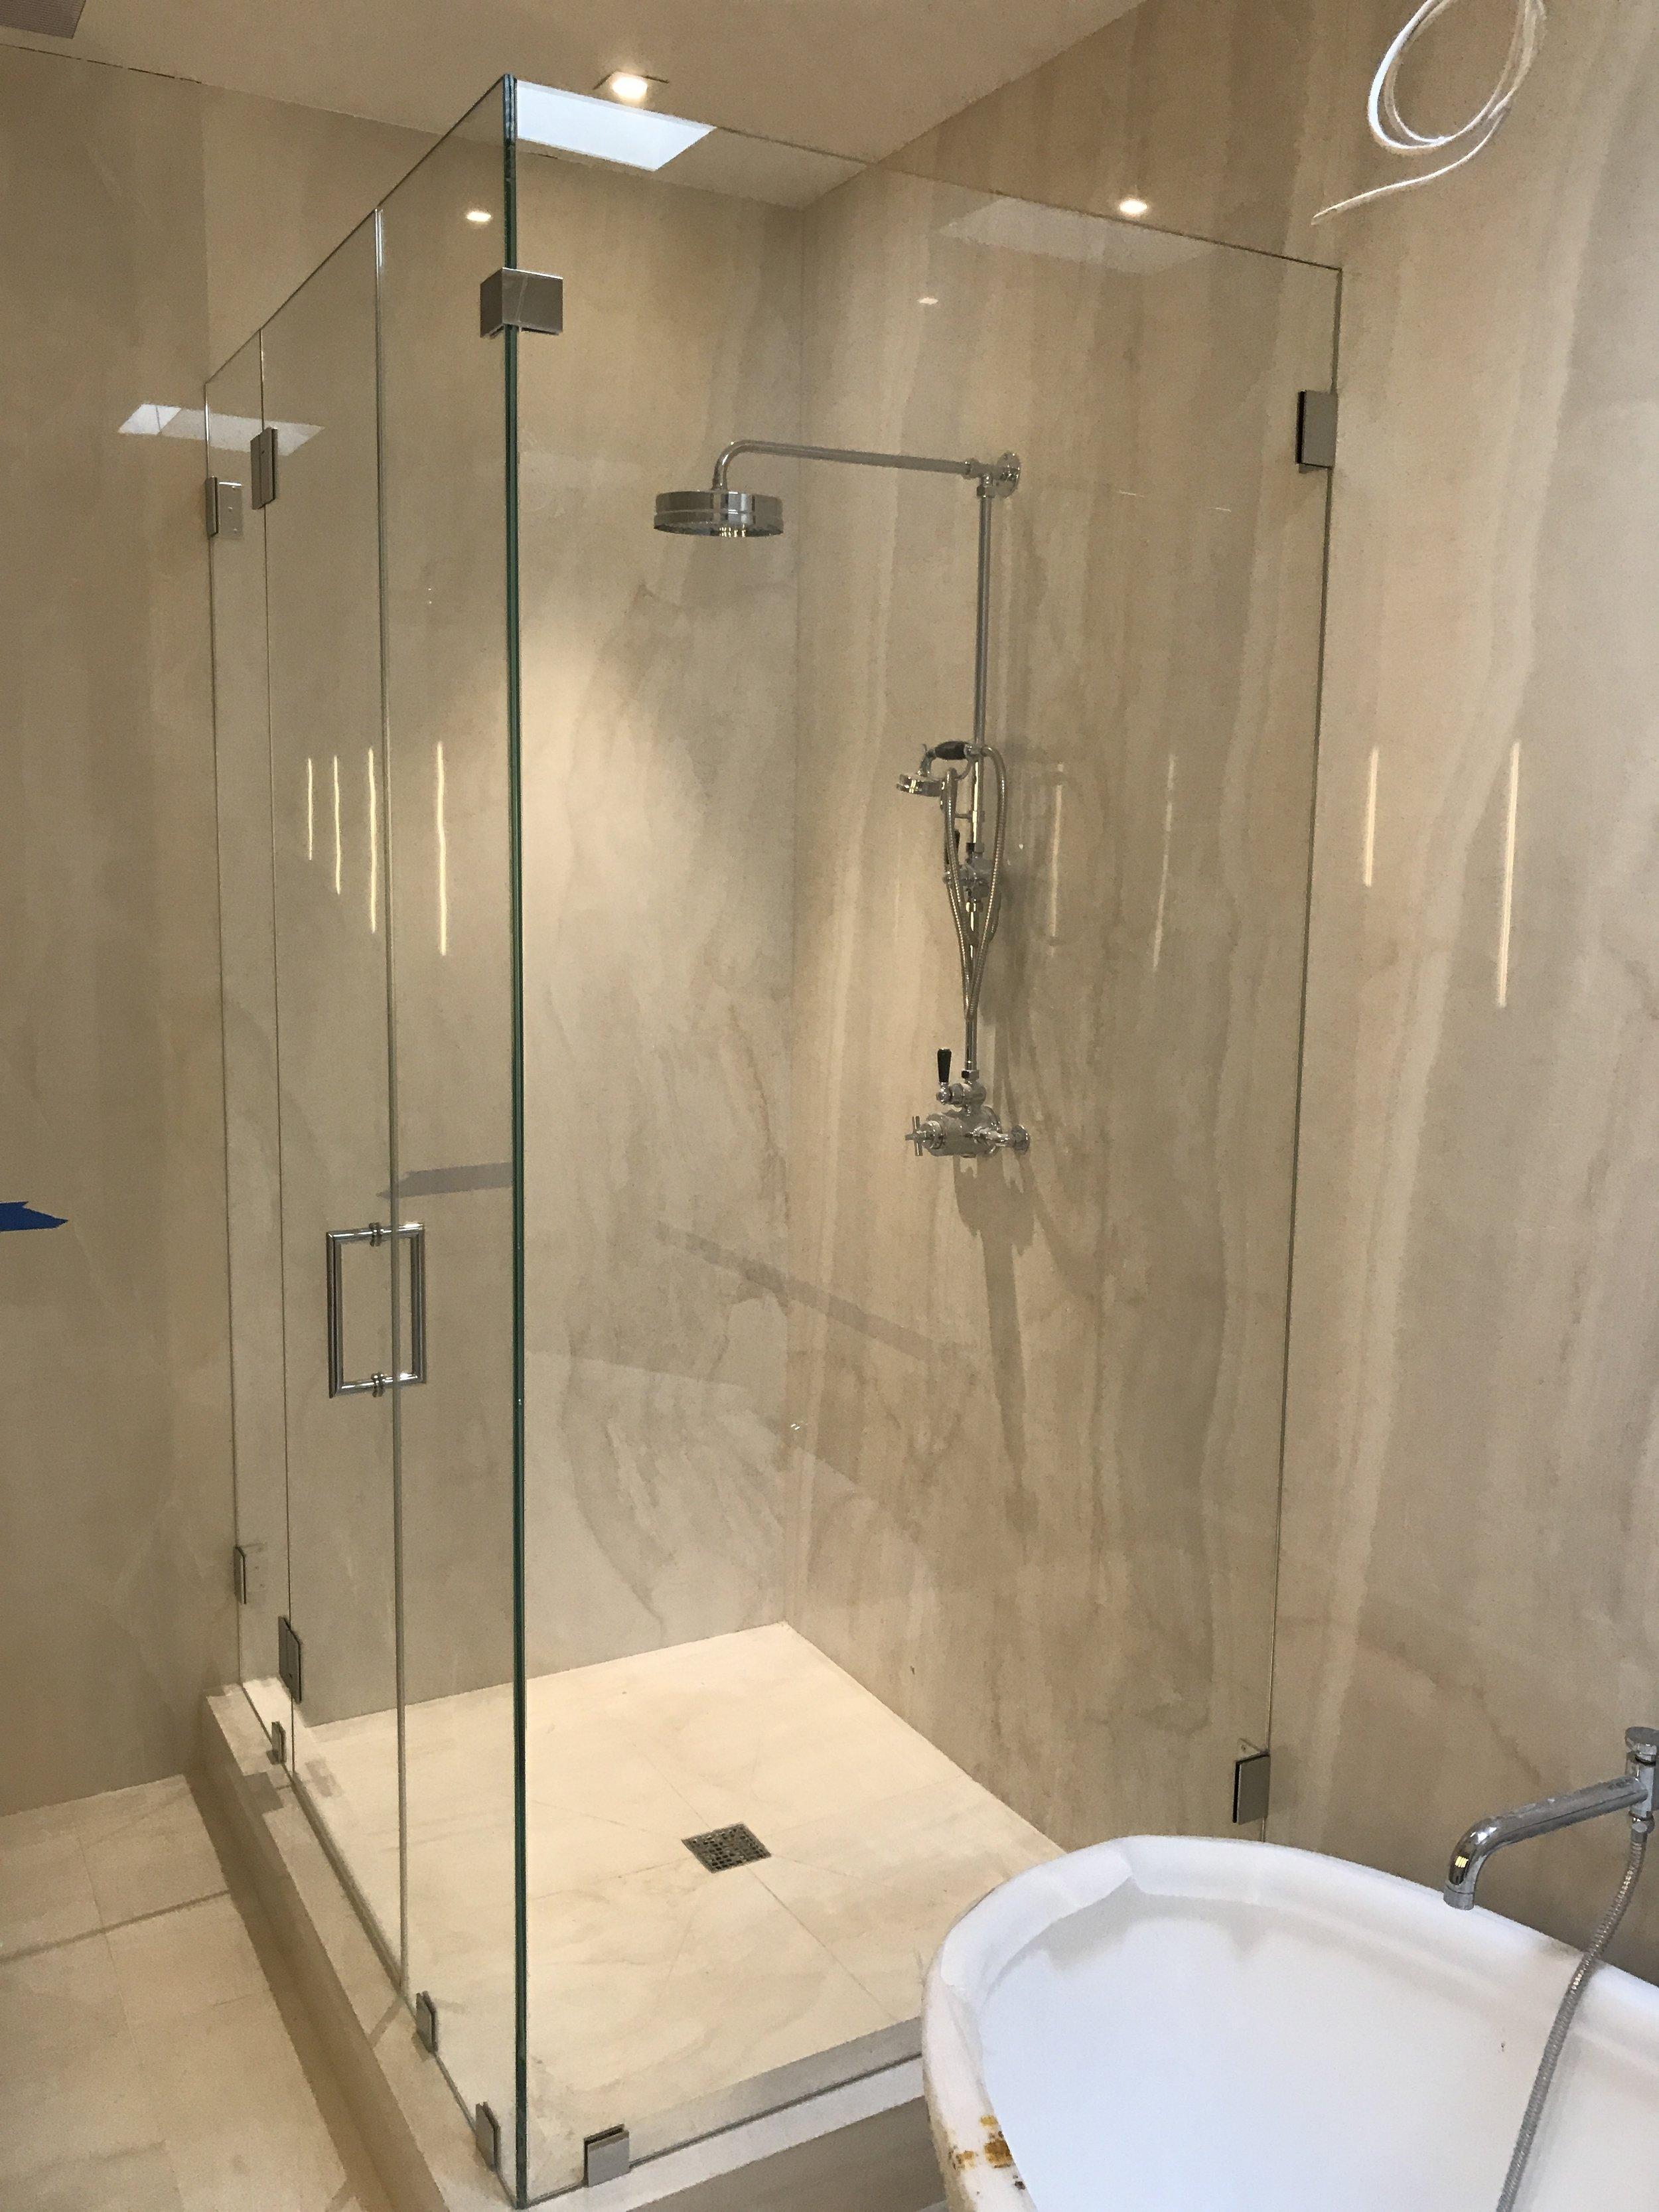 Tiled Shower gets a new Glass Door